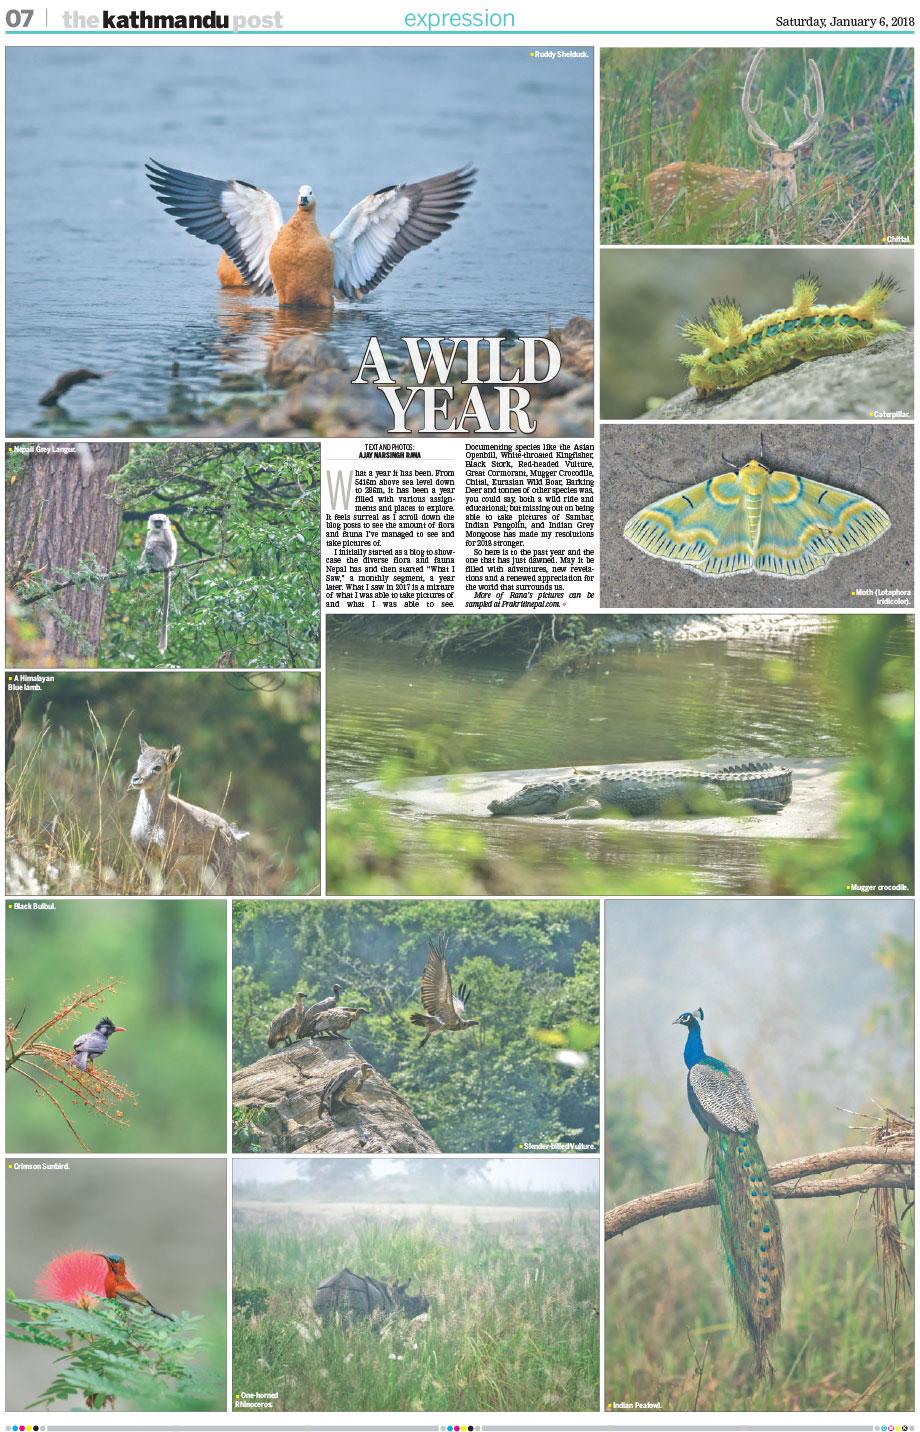 The Kathmandu Post_Wild Year